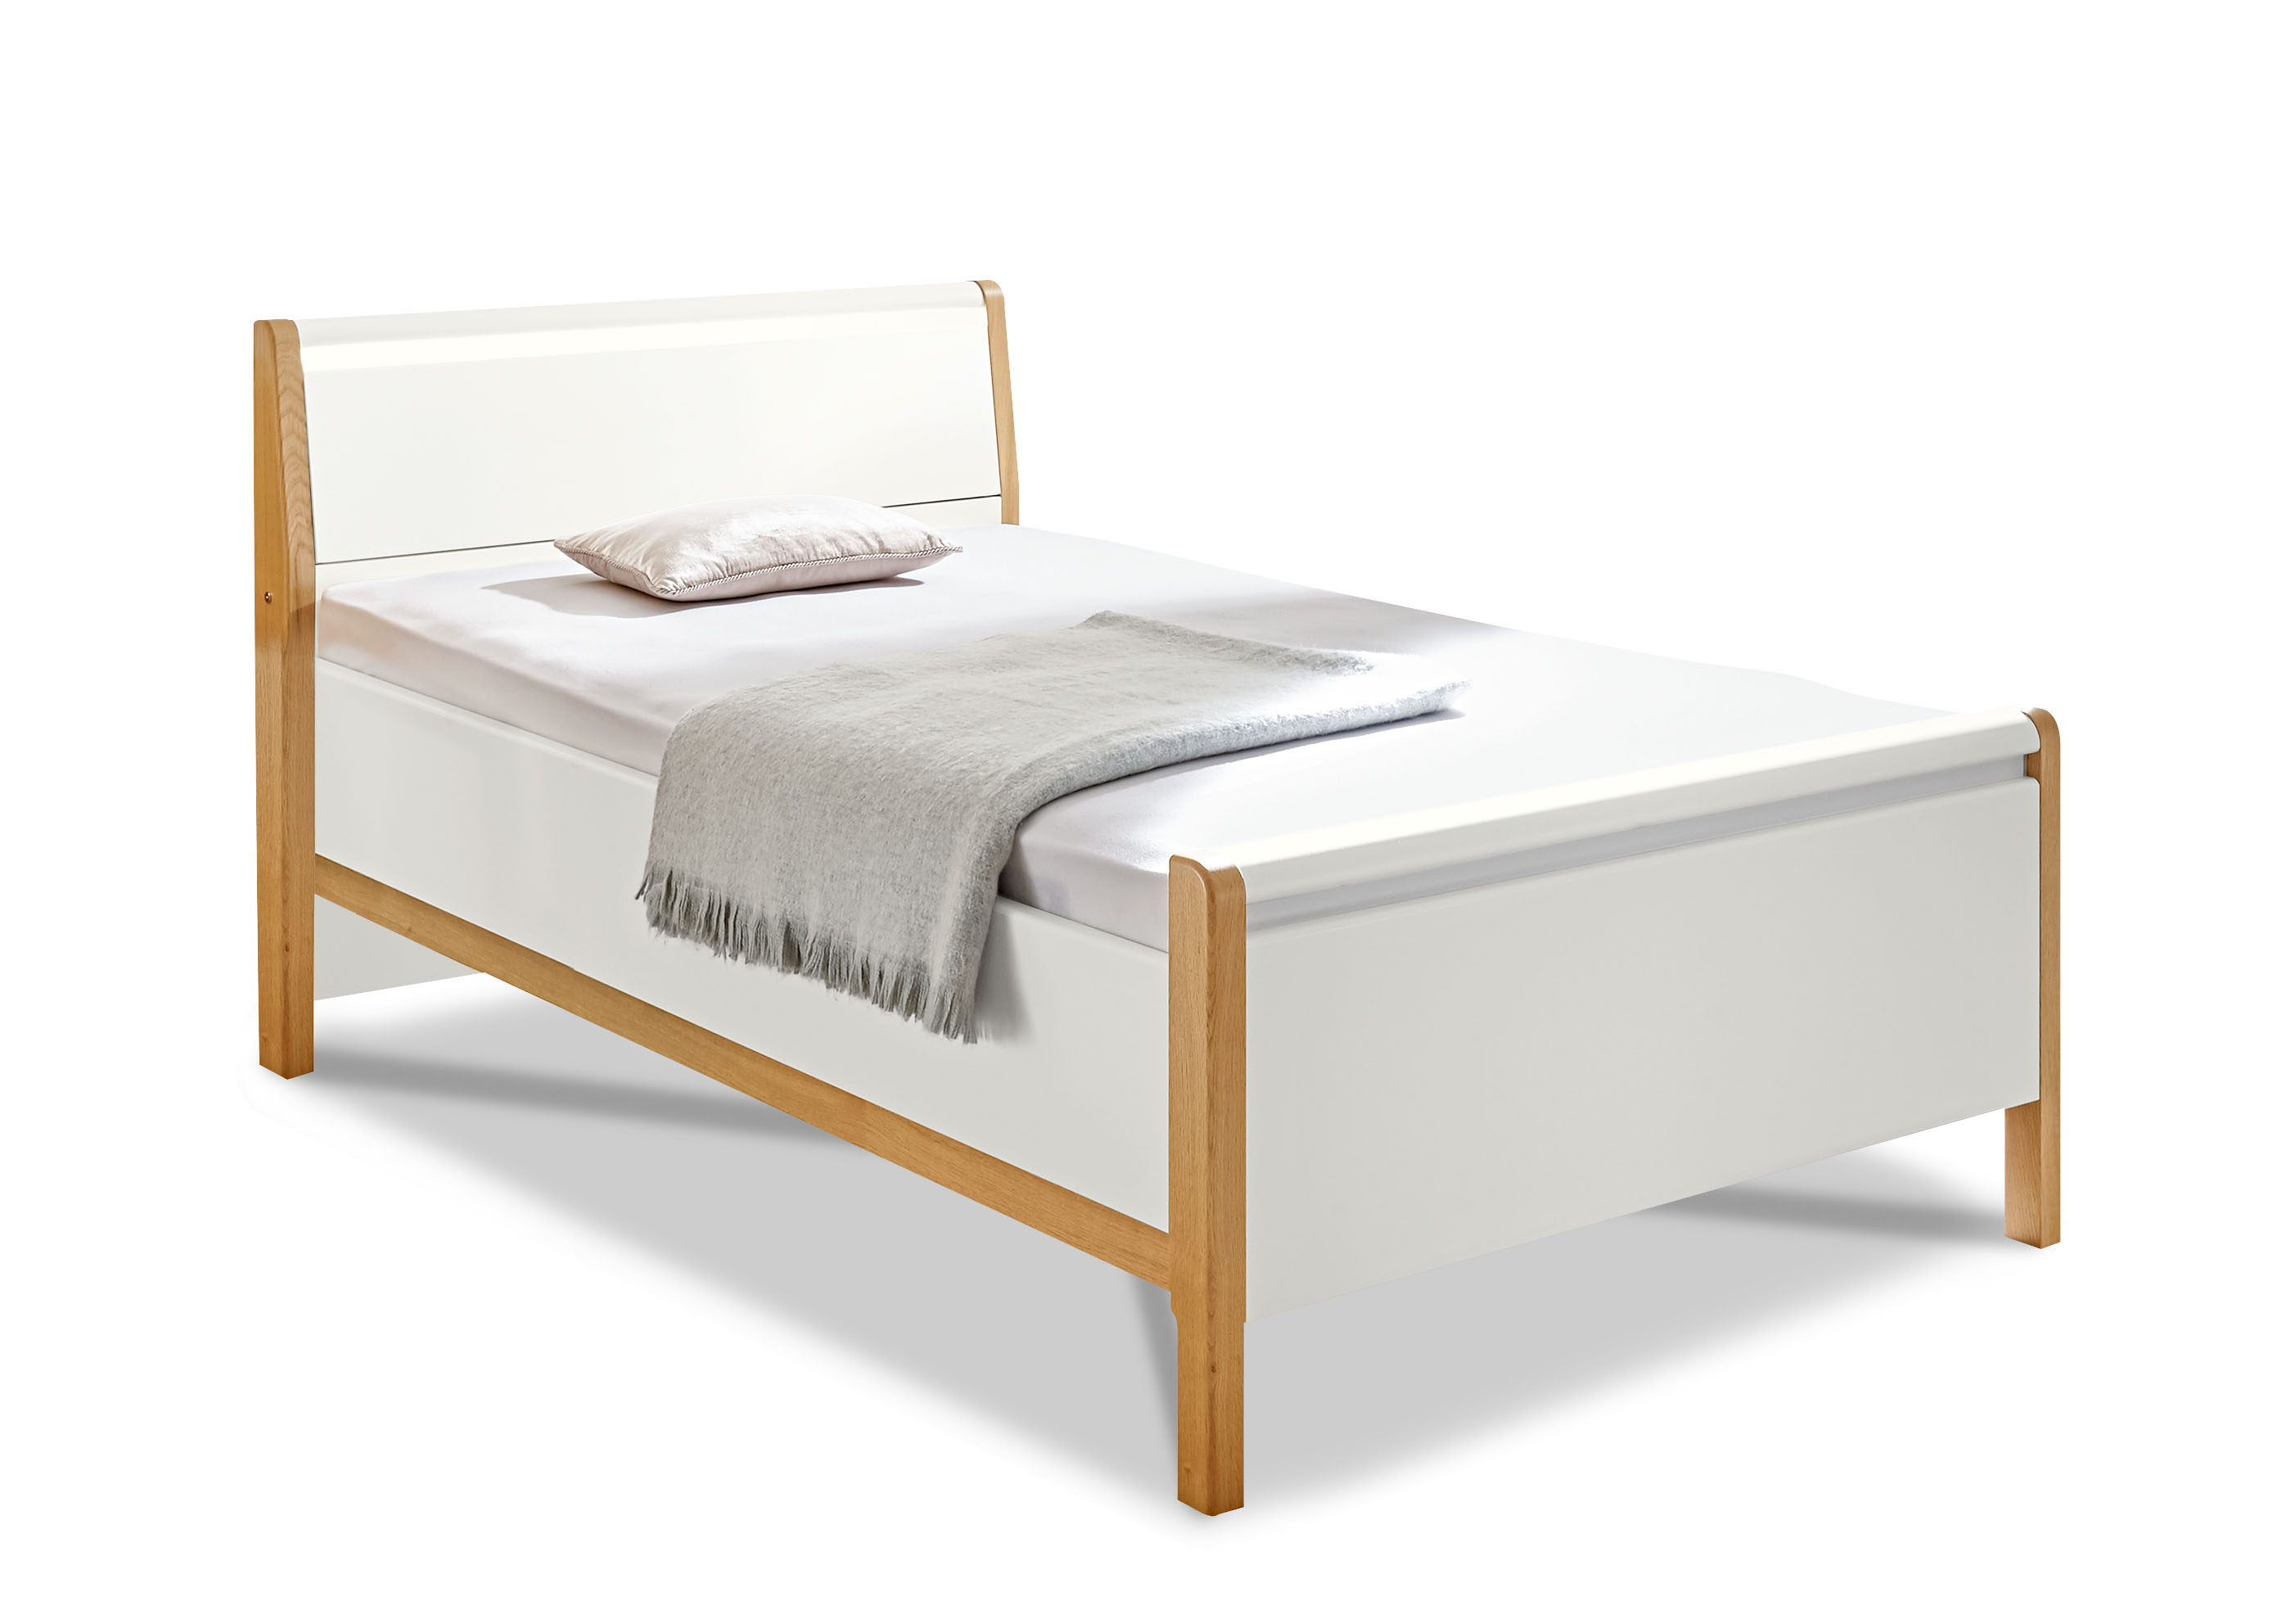 bett molto comfort kristall grau eiche. Black Bedroom Furniture Sets. Home Design Ideas